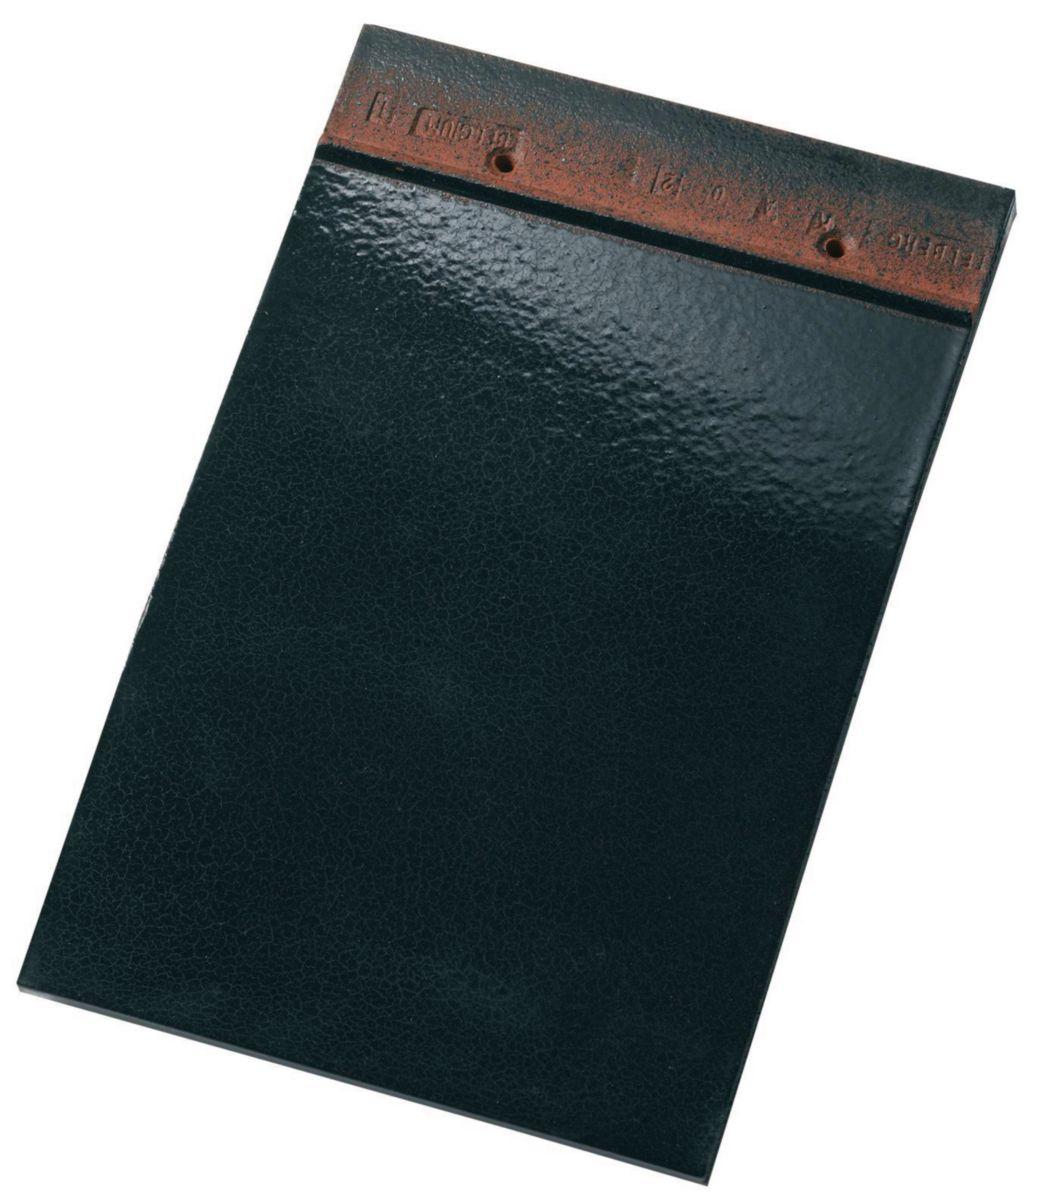 koramic tuile plate 301 terre cuite noir maill. Black Bedroom Furniture Sets. Home Design Ideas